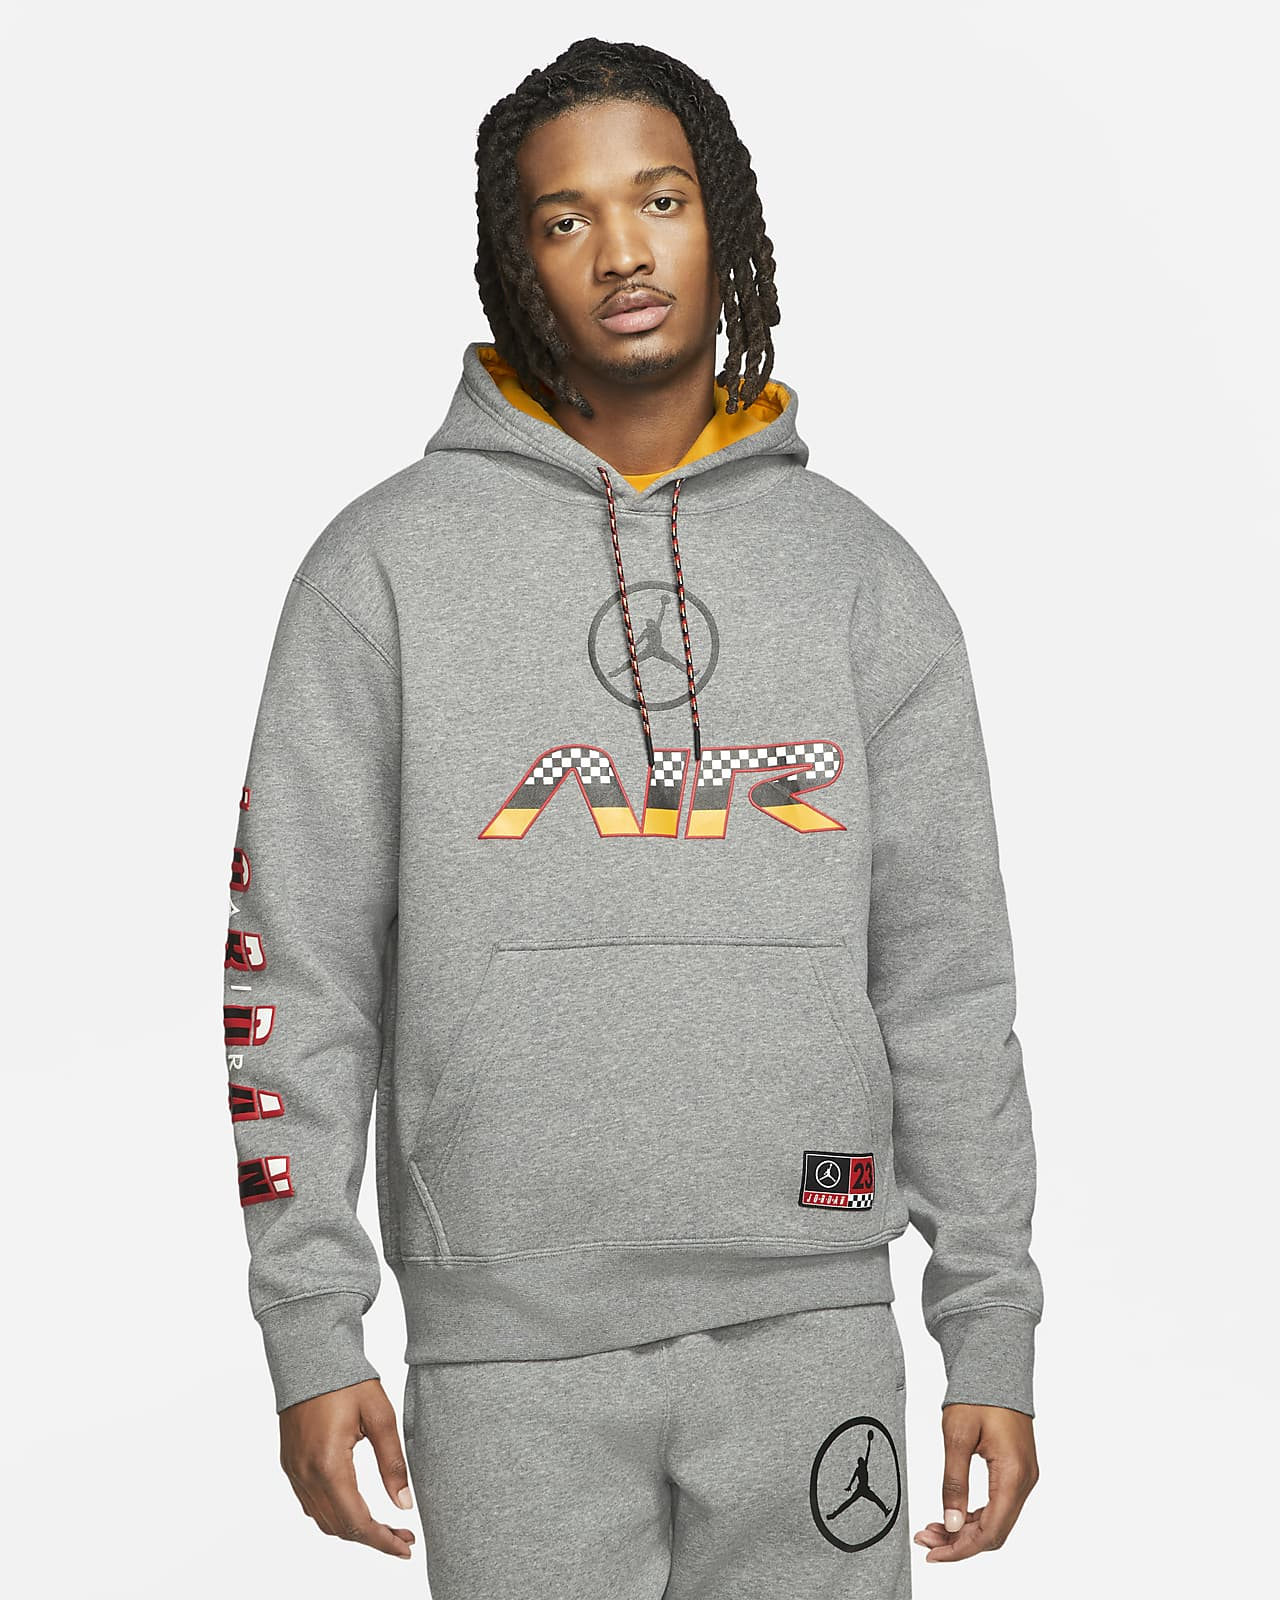 Jordan Sport DNA HBR Kapüşonlu Erkek Sweatshirt'ü